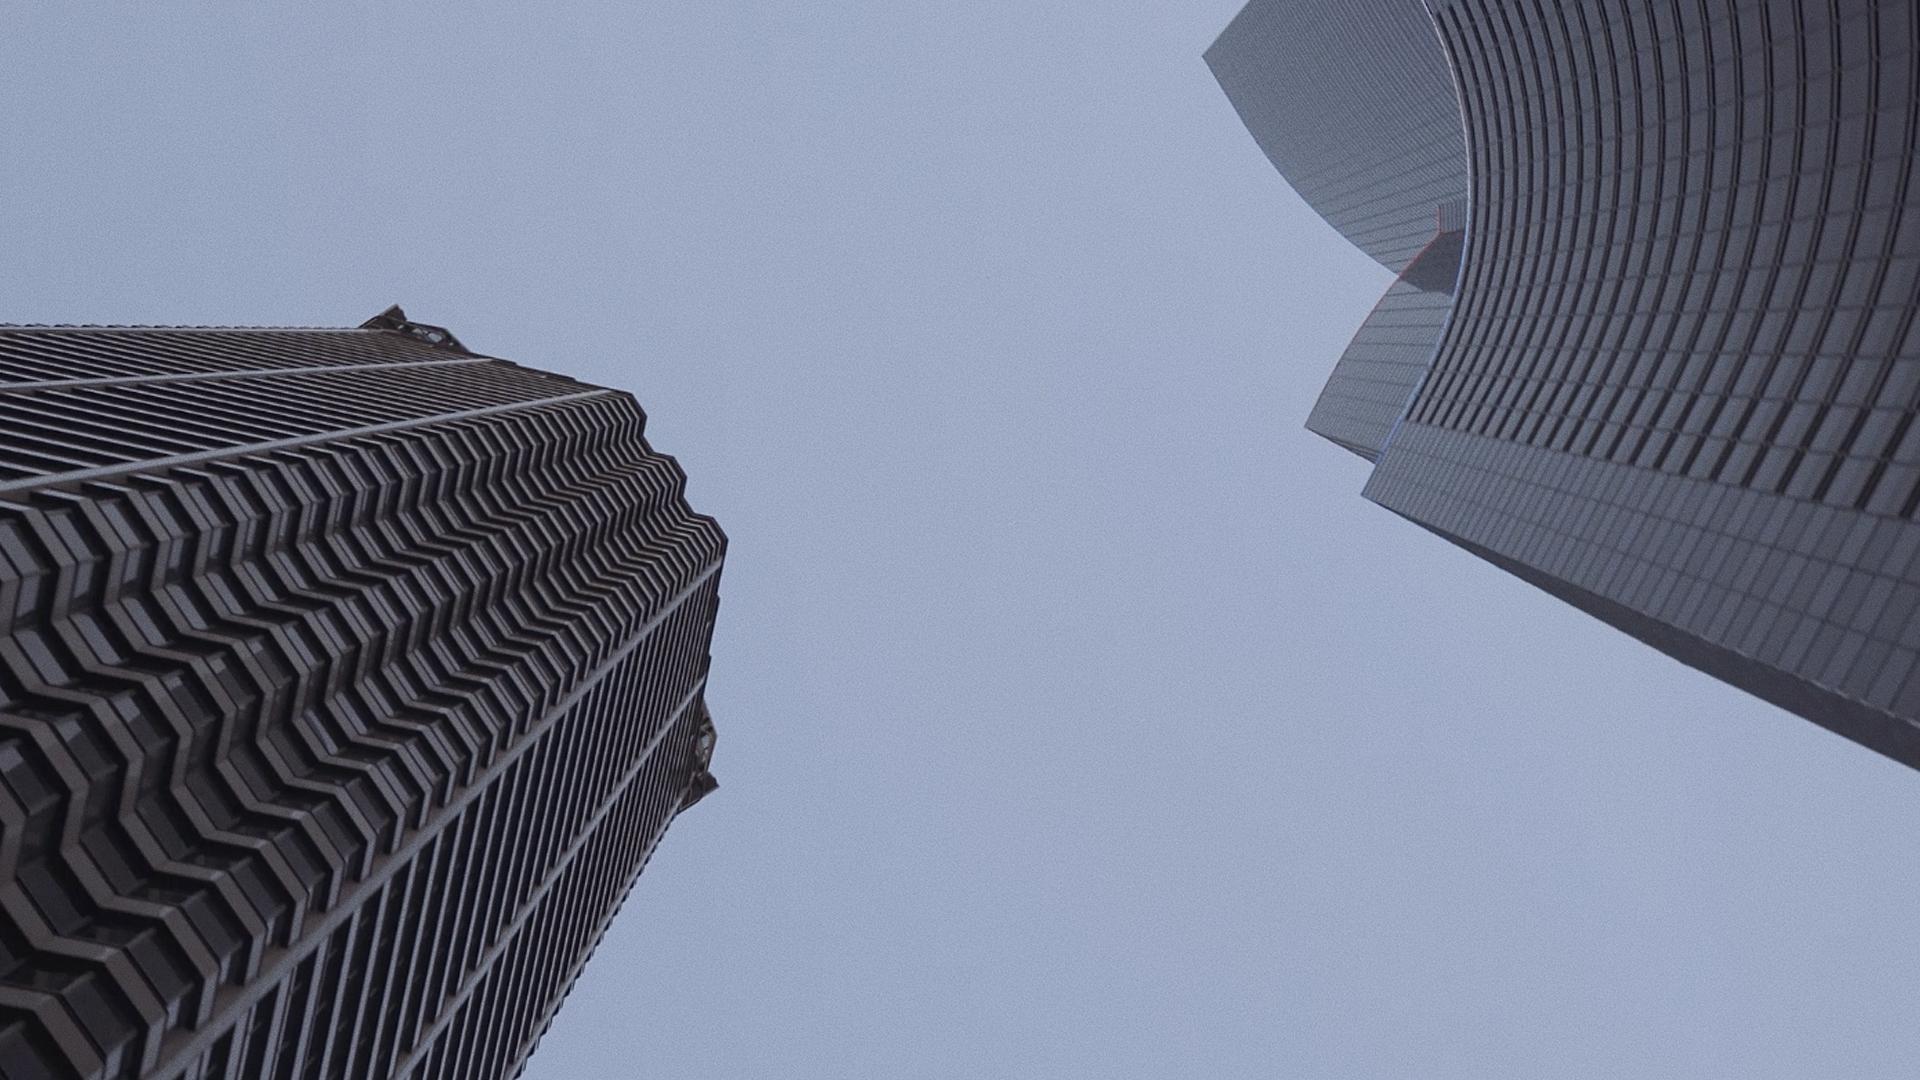 Tk_com_slideshow_cityscape.jpg